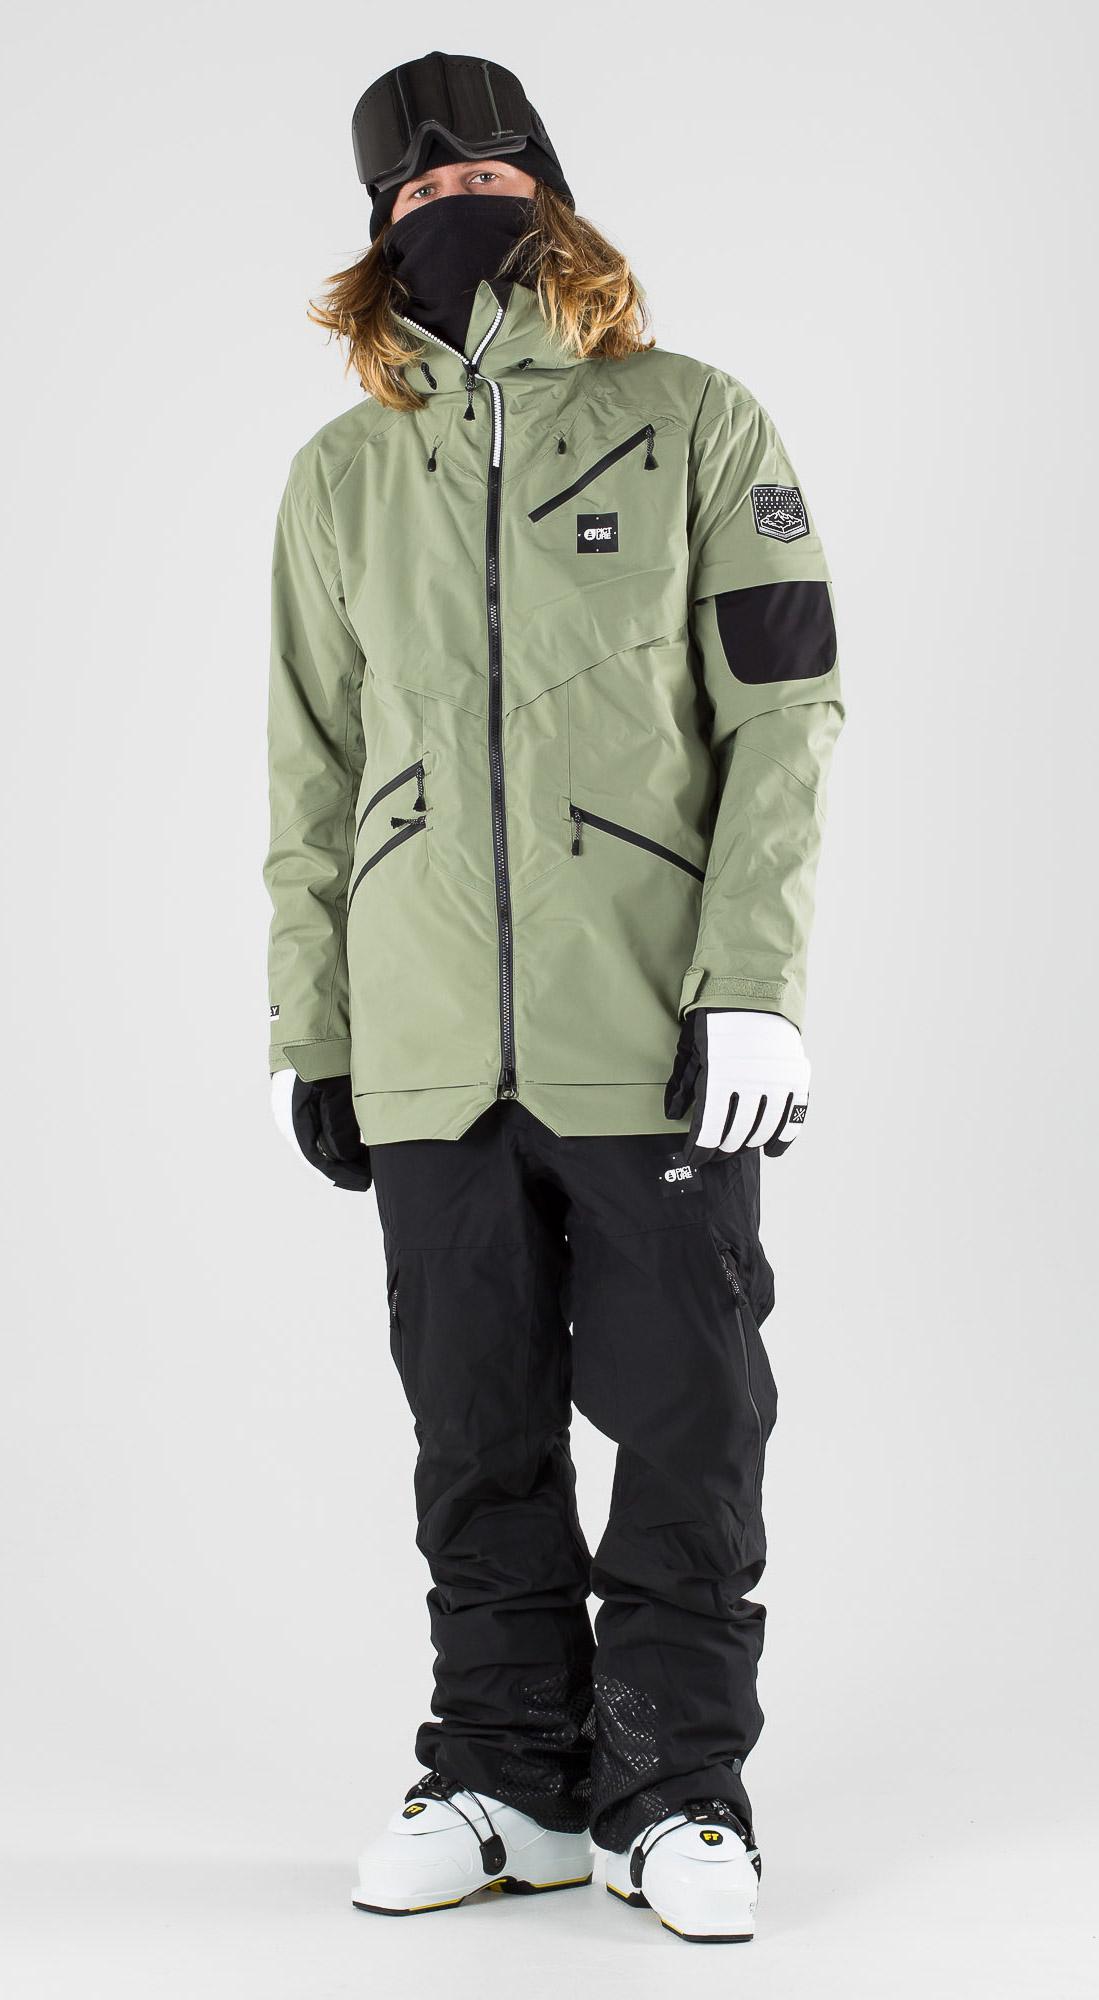 Snowboard Klær Herre | Rask og Gratis Levering | Ridestore.no